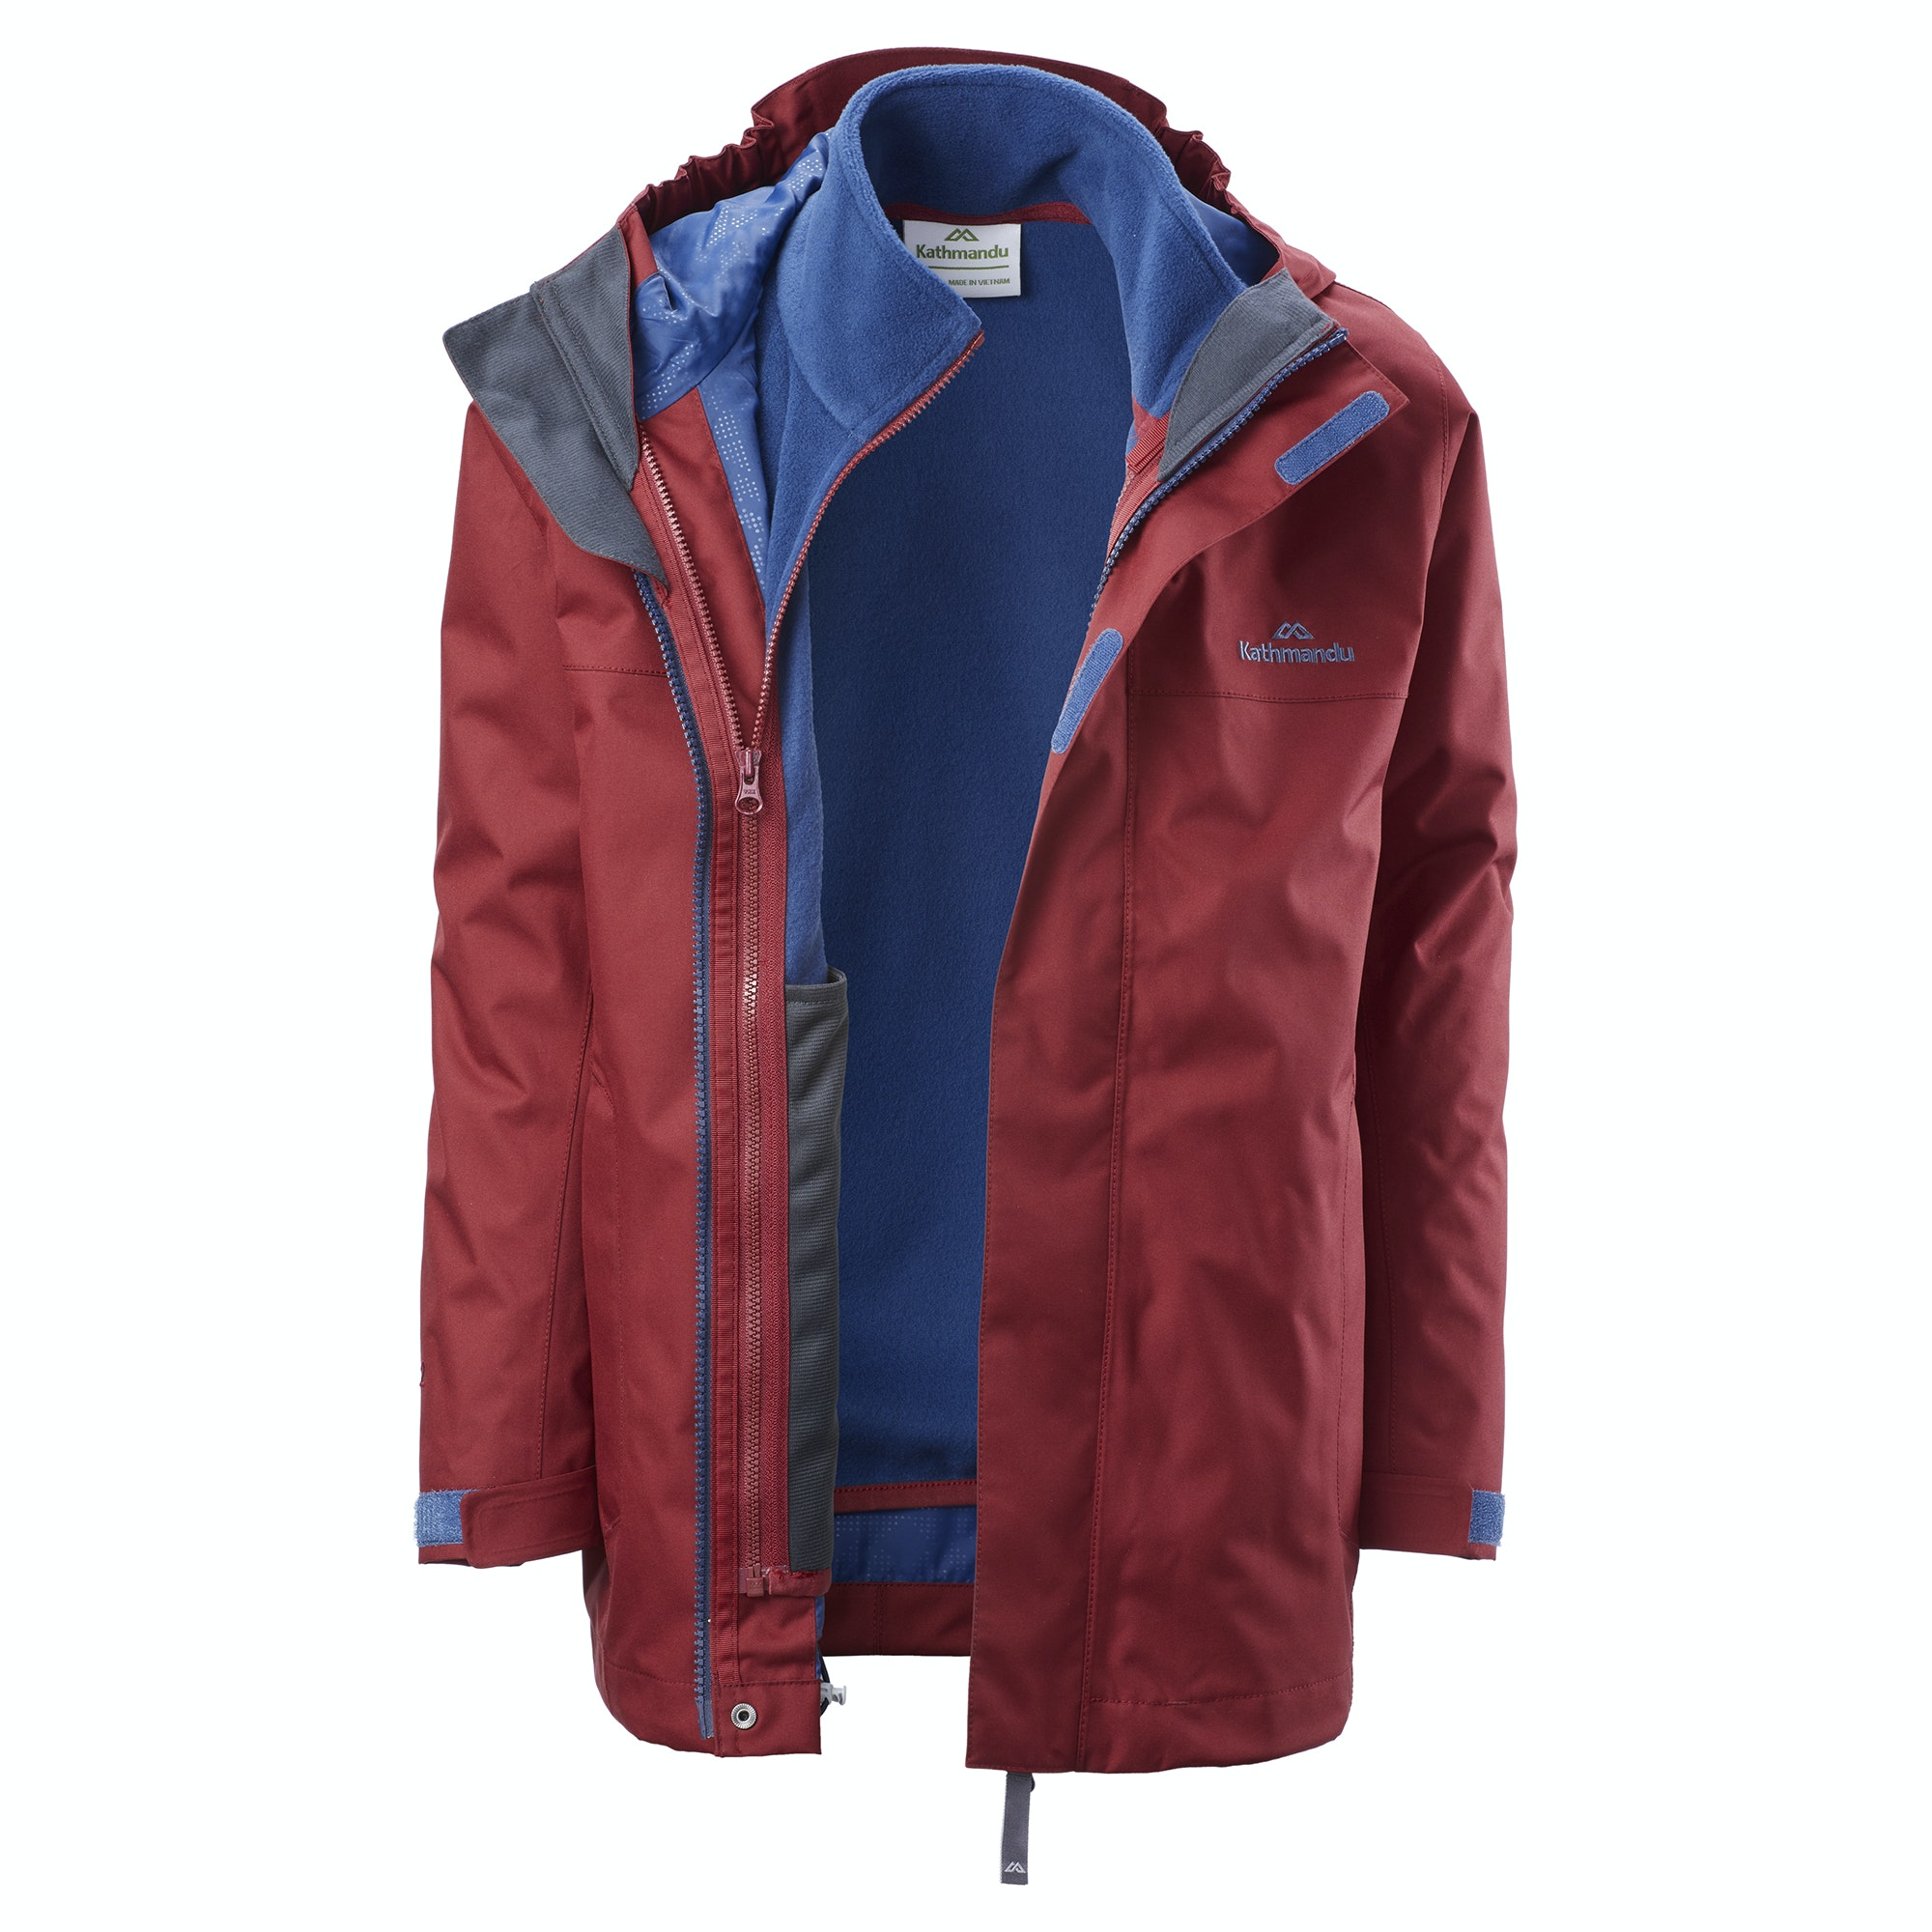 d7ce68e26 Details about Kathmandu Chiecco Kids' Girls' Boys' Waterproof 3 in 1 Hooded Winter  Jacket v2